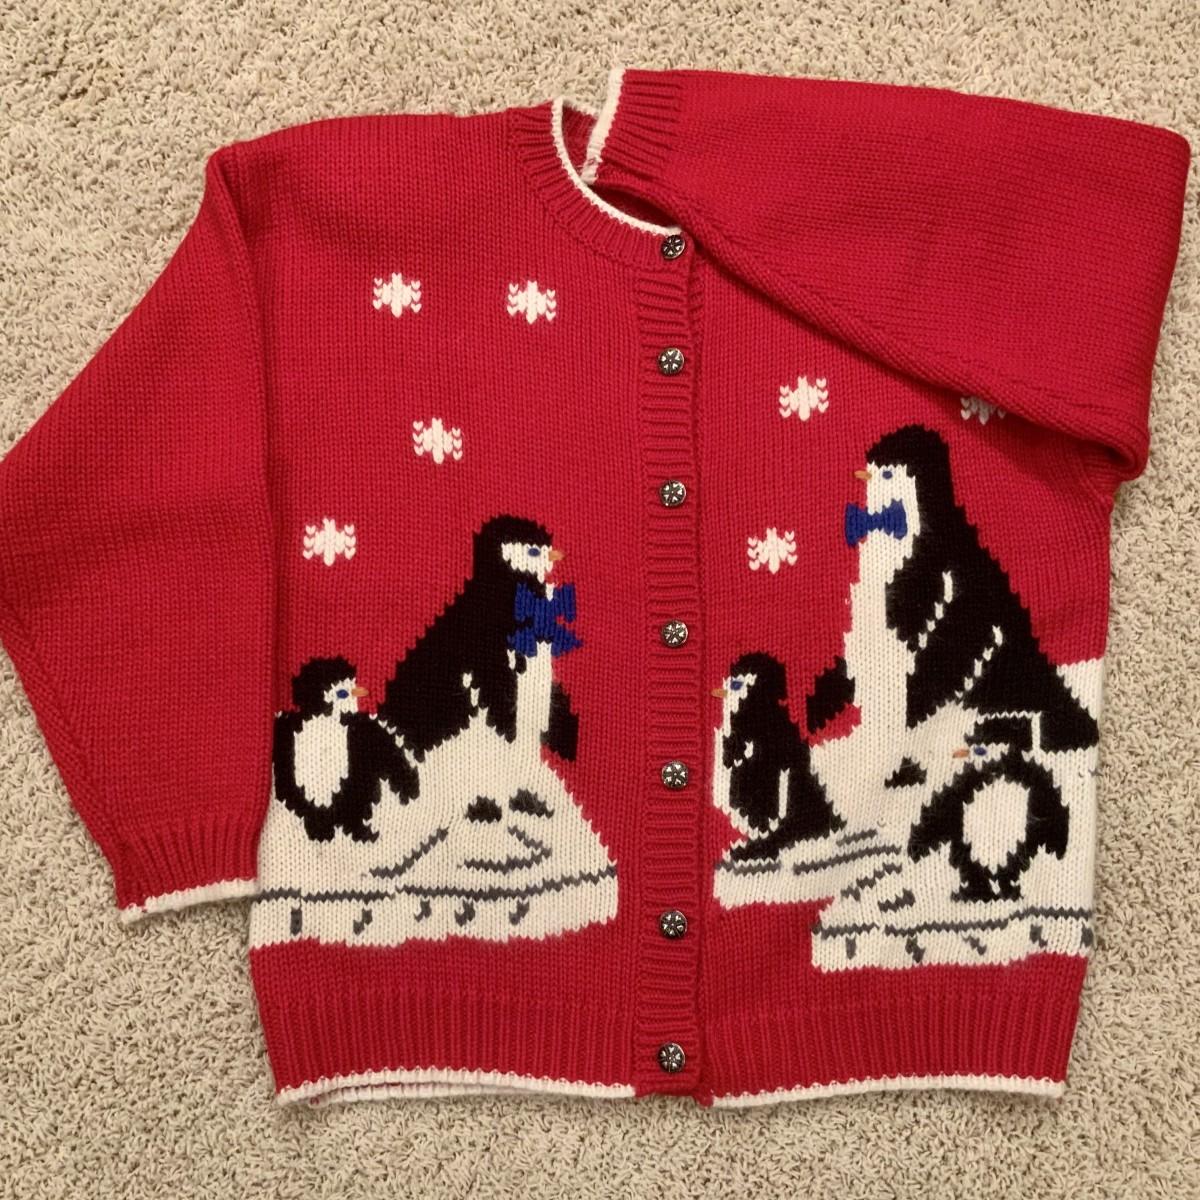 The original 1990 sweater.